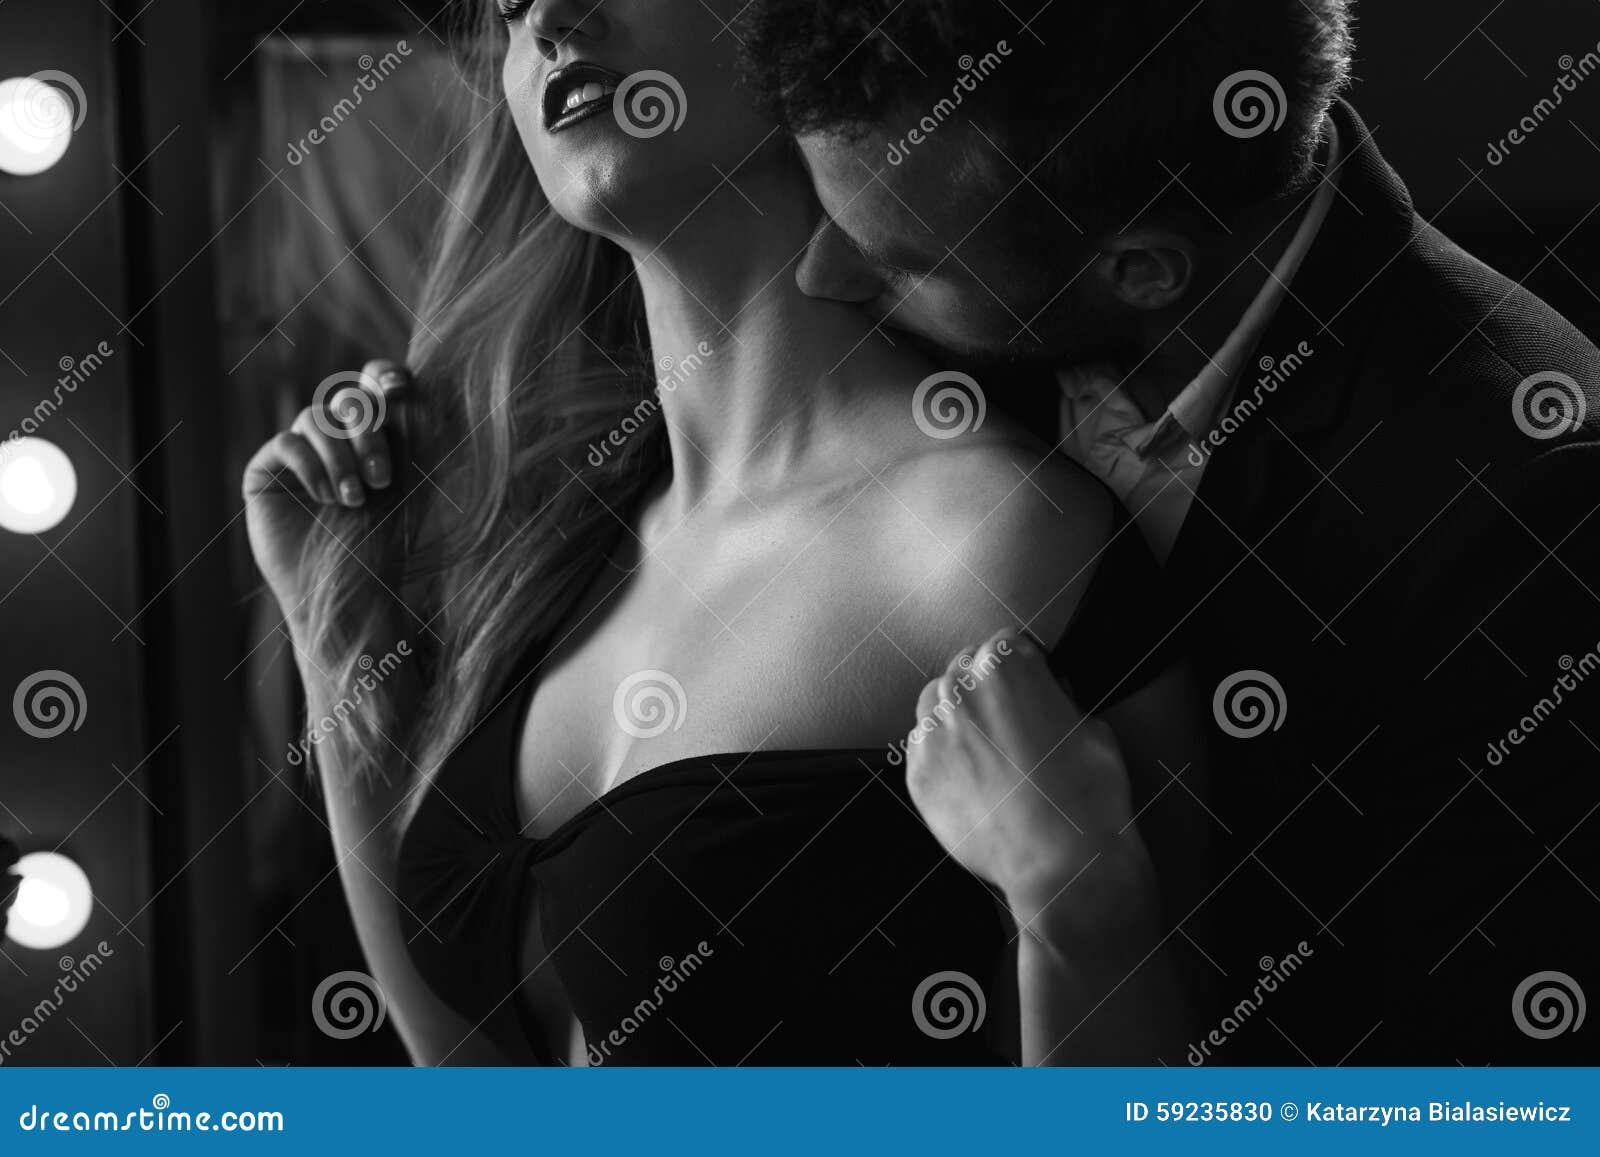 Pares cariñosos durante foreplay romántico